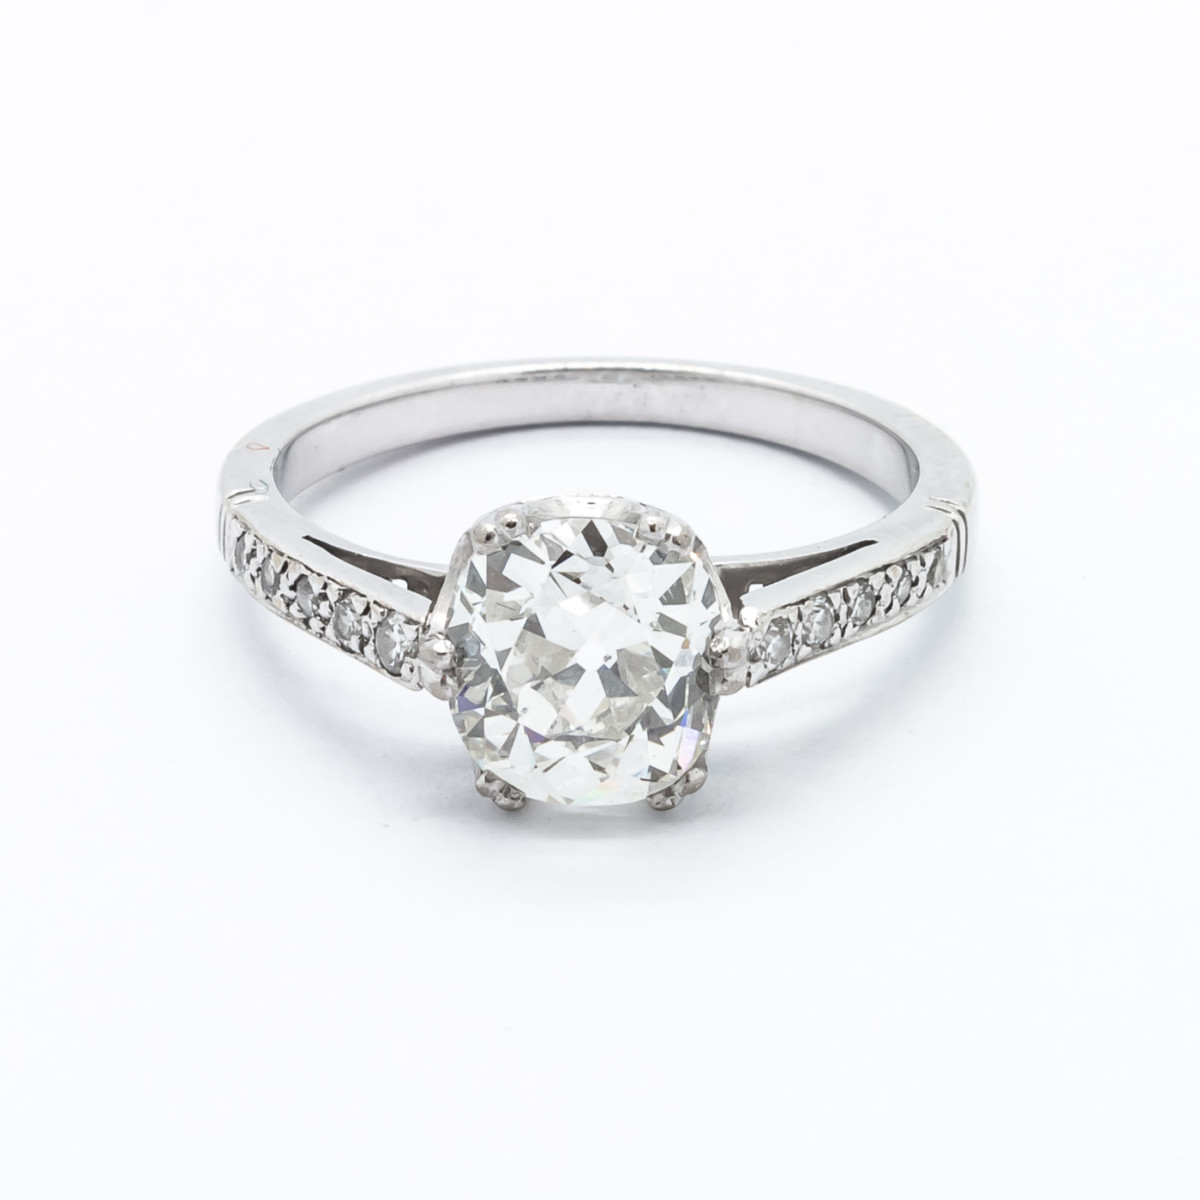 36e73203dd8f2 Antique Cushion Cut Diamond Engagement Ring, 1.52cts